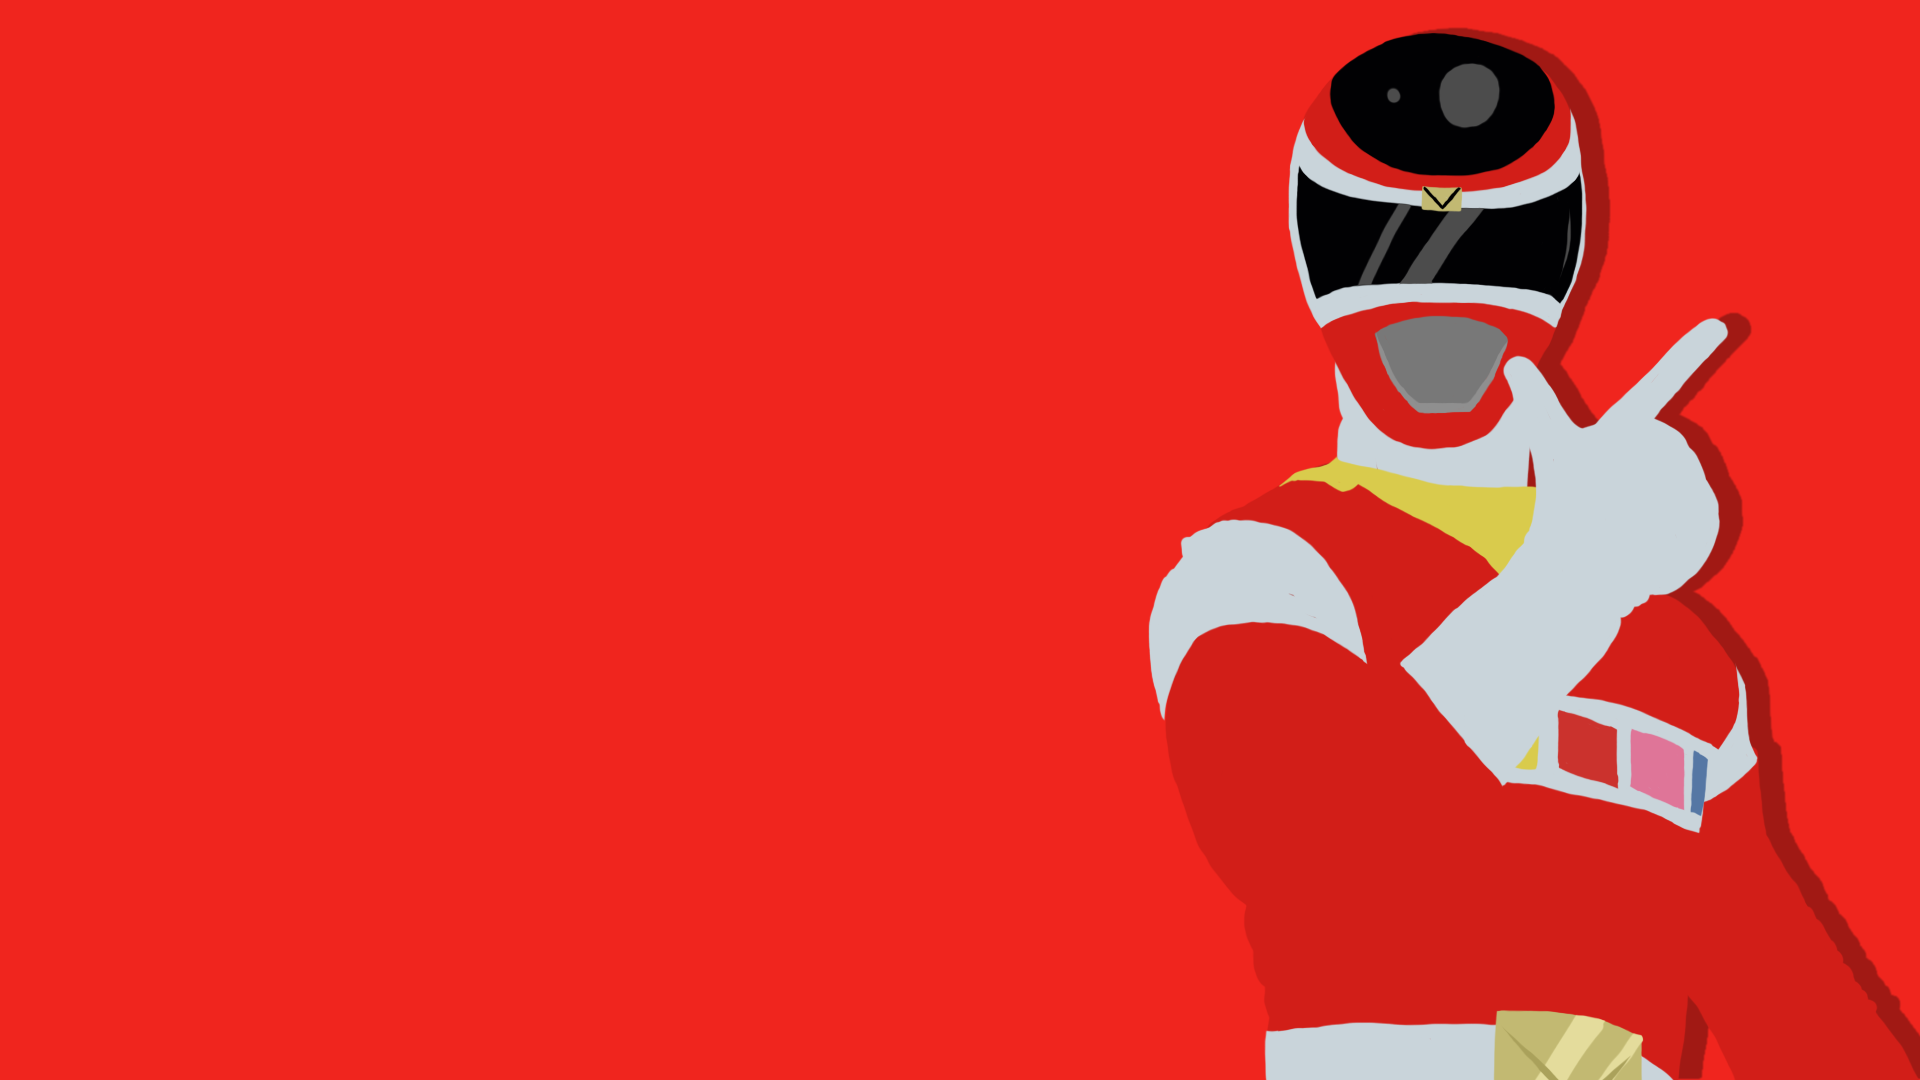 Red Ranger Power Rangers In Space By Travp333 On Deviantart